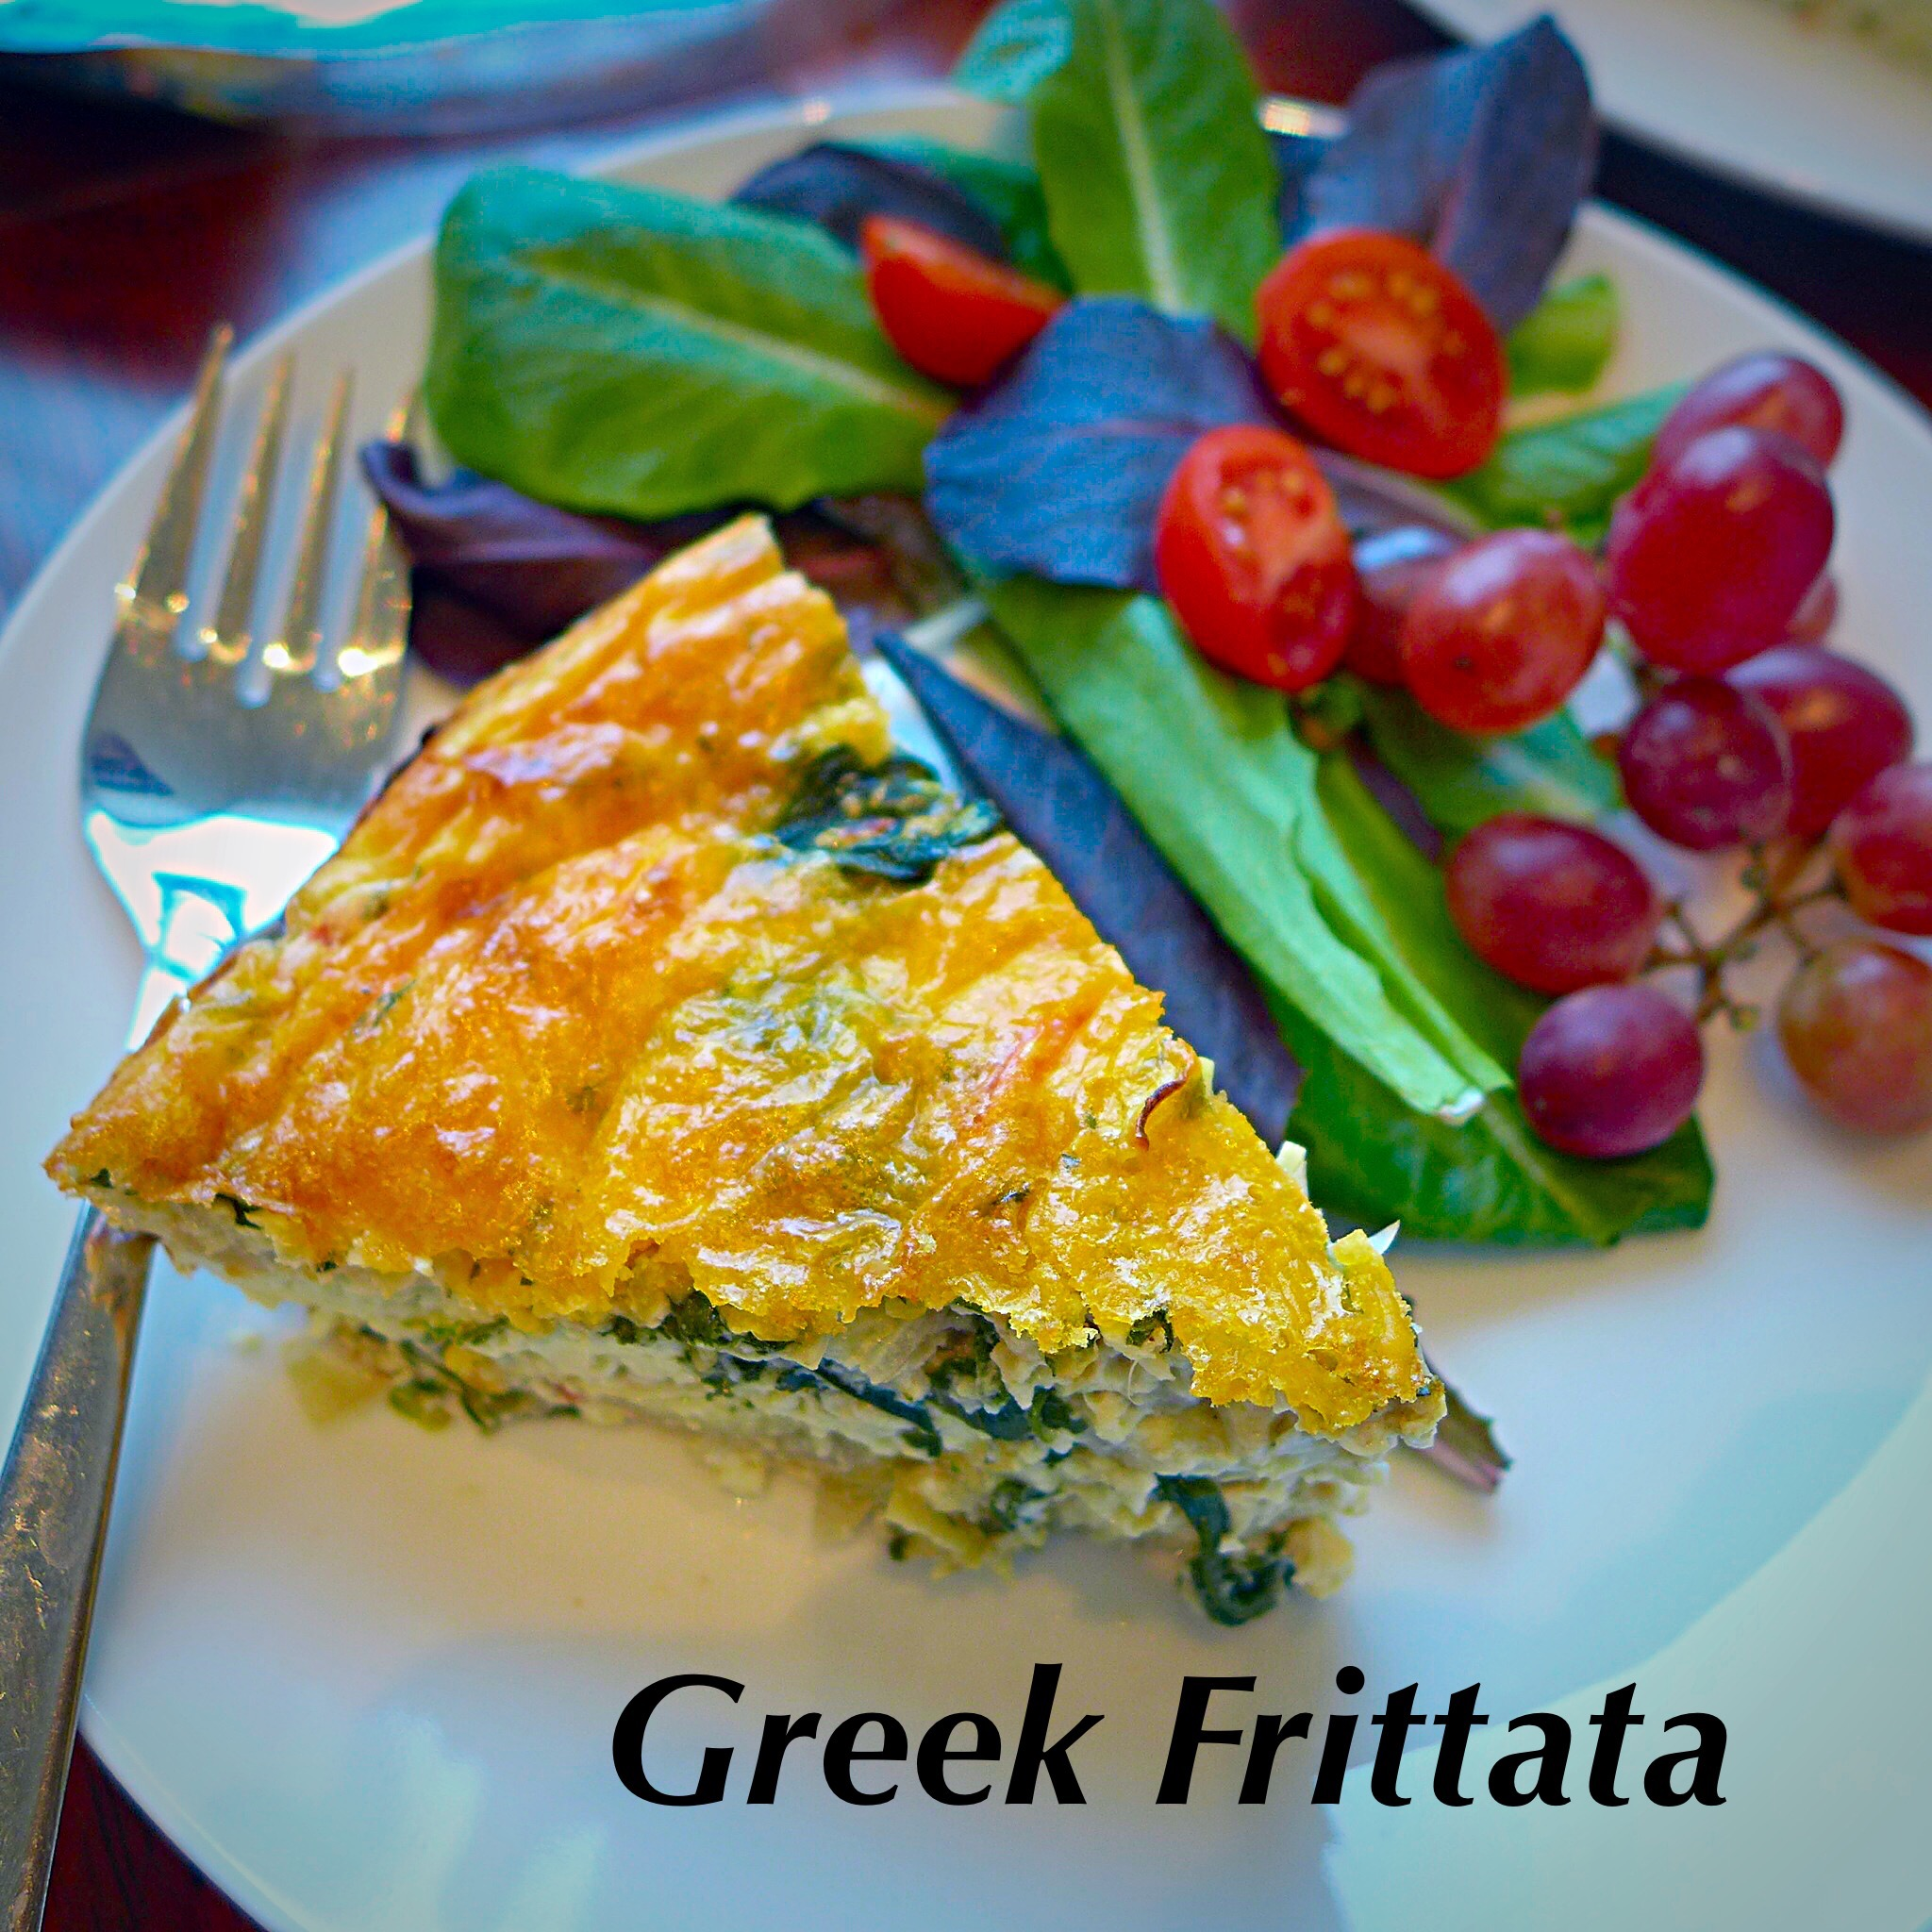 Greek Frittata, the #1 most popular side on diginwithdana!